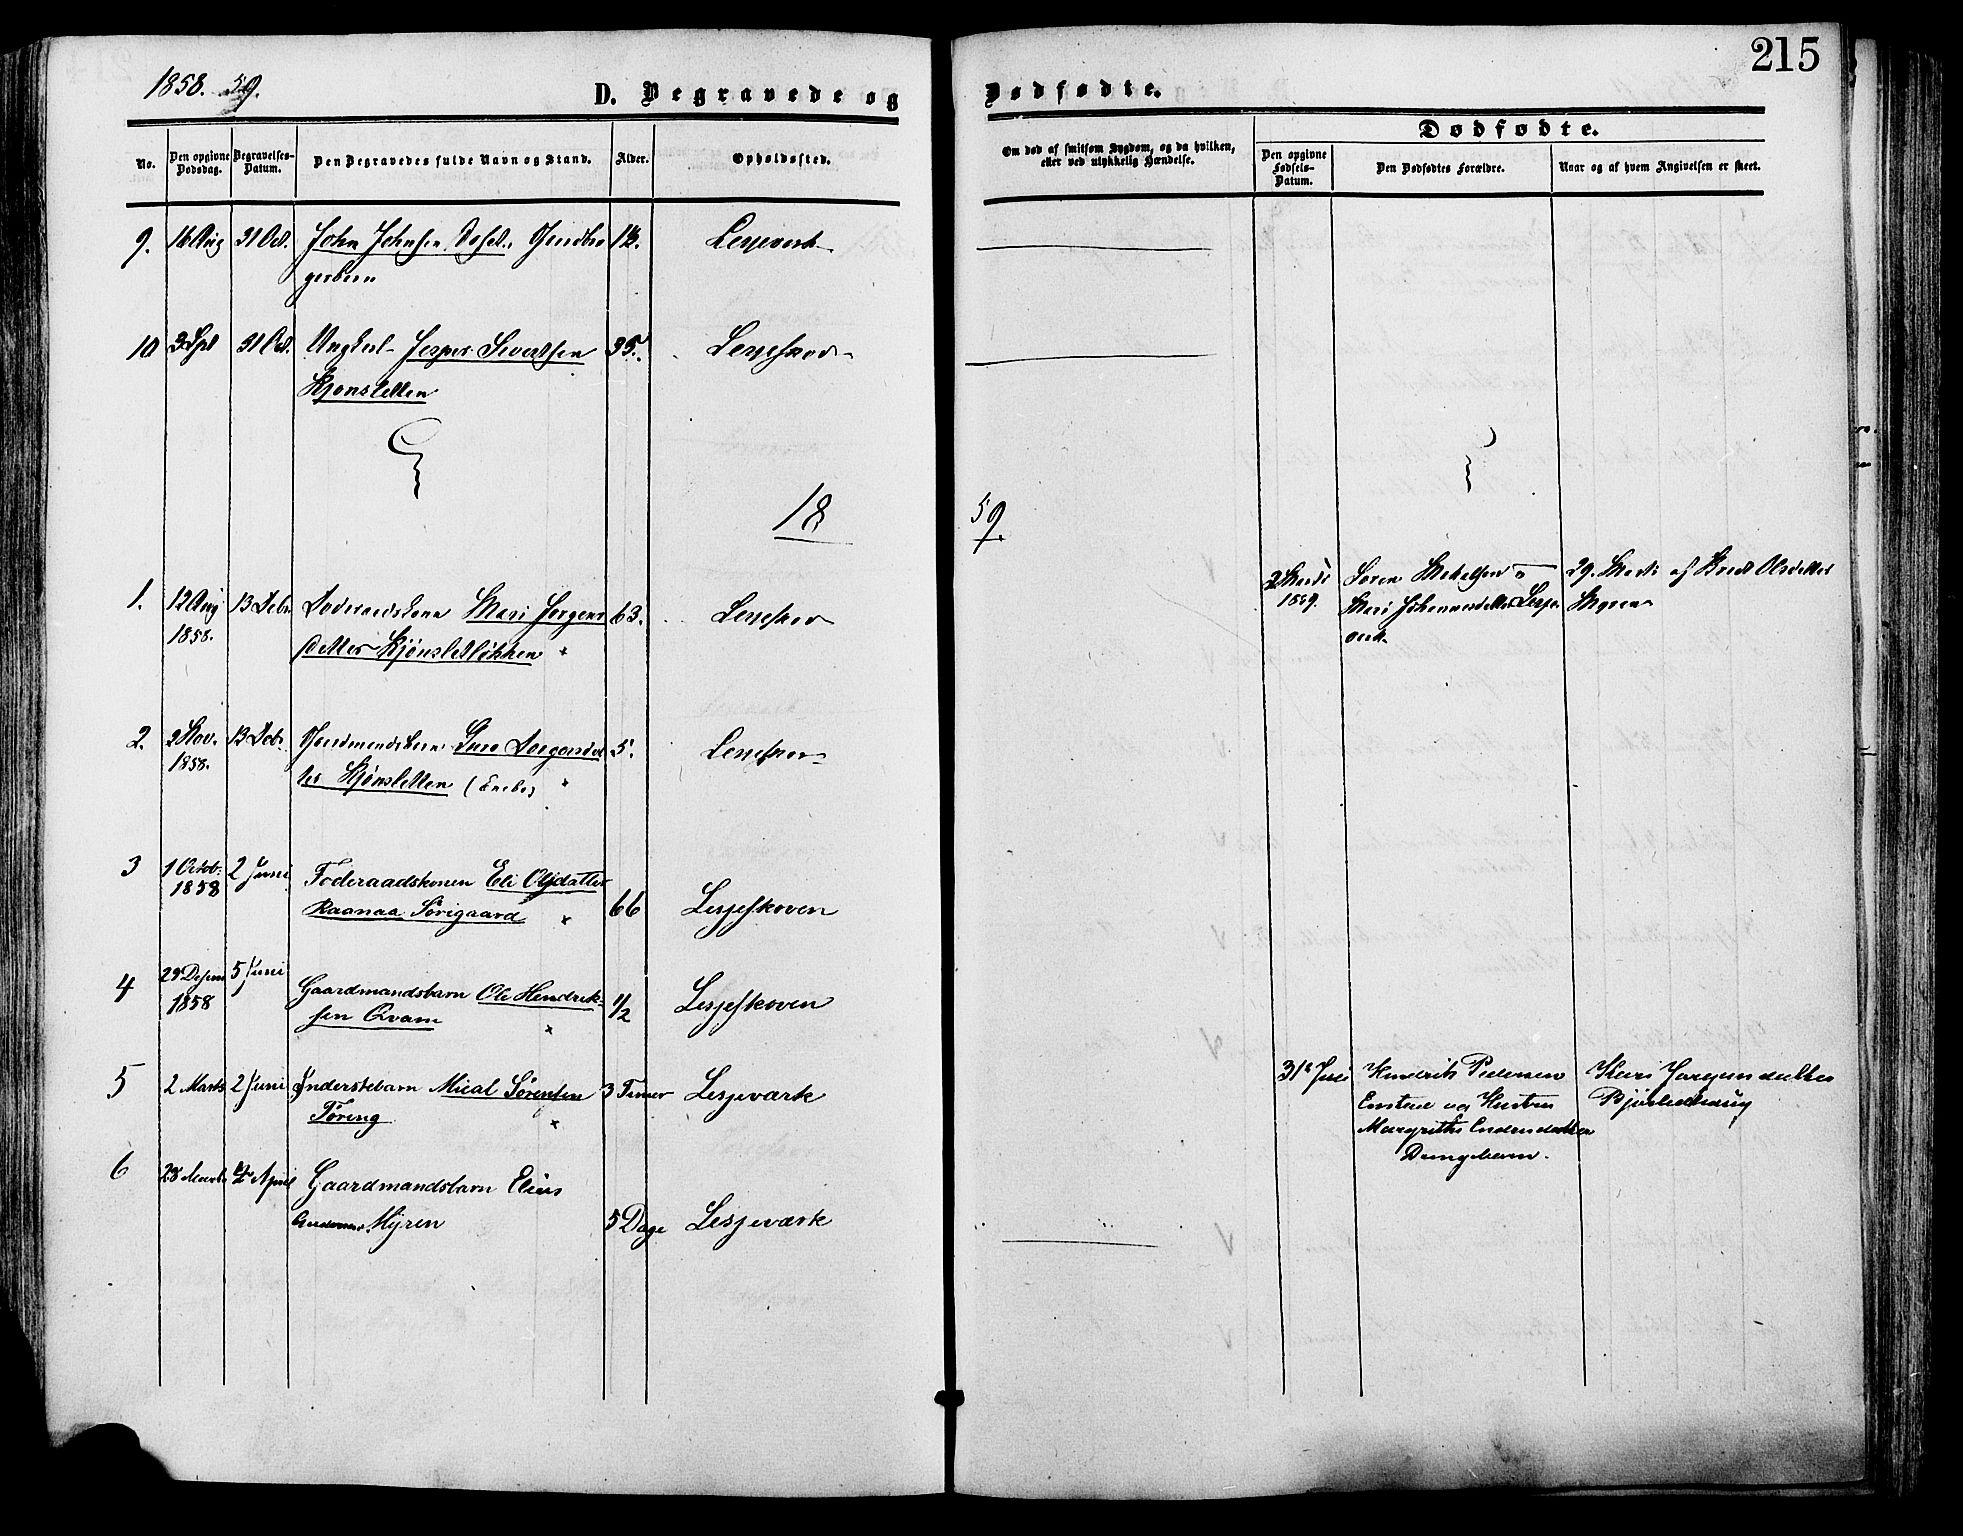 SAH, Lesja prestekontor, Ministerialbok nr. 9, 1854-1889, s. 215